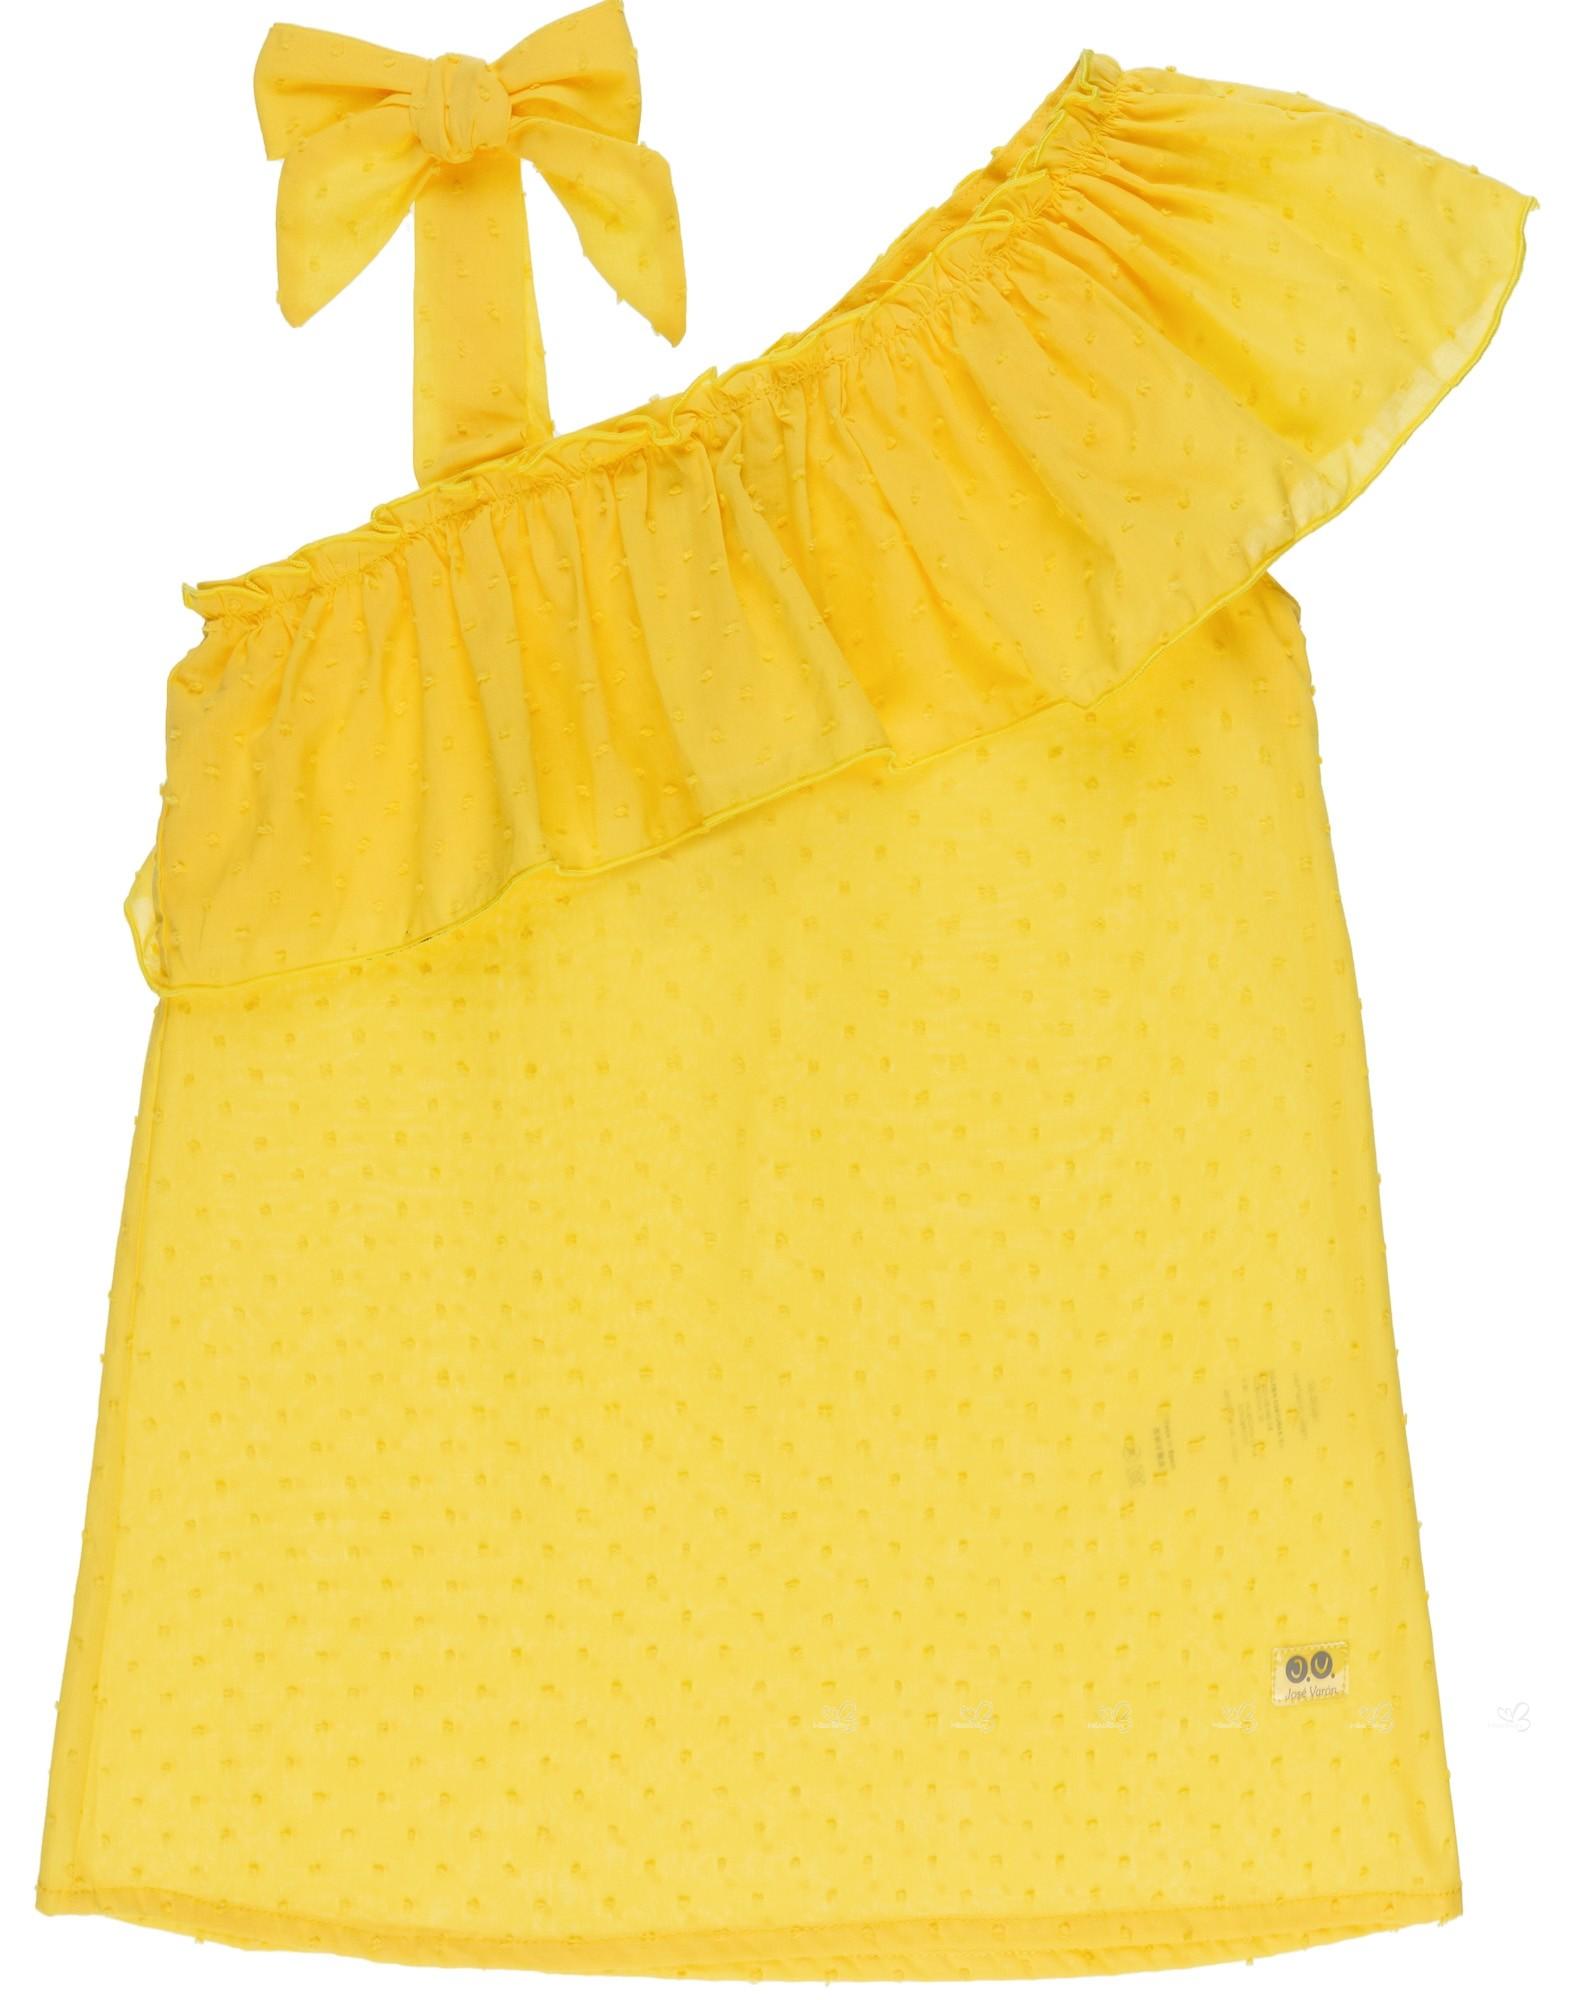 3cd2fcfba0 Home  Girls Yellow Polka Dot Sundress. J.V. José Varón Vestido Niña Playa  Volante Asimétrico Amarillo ...